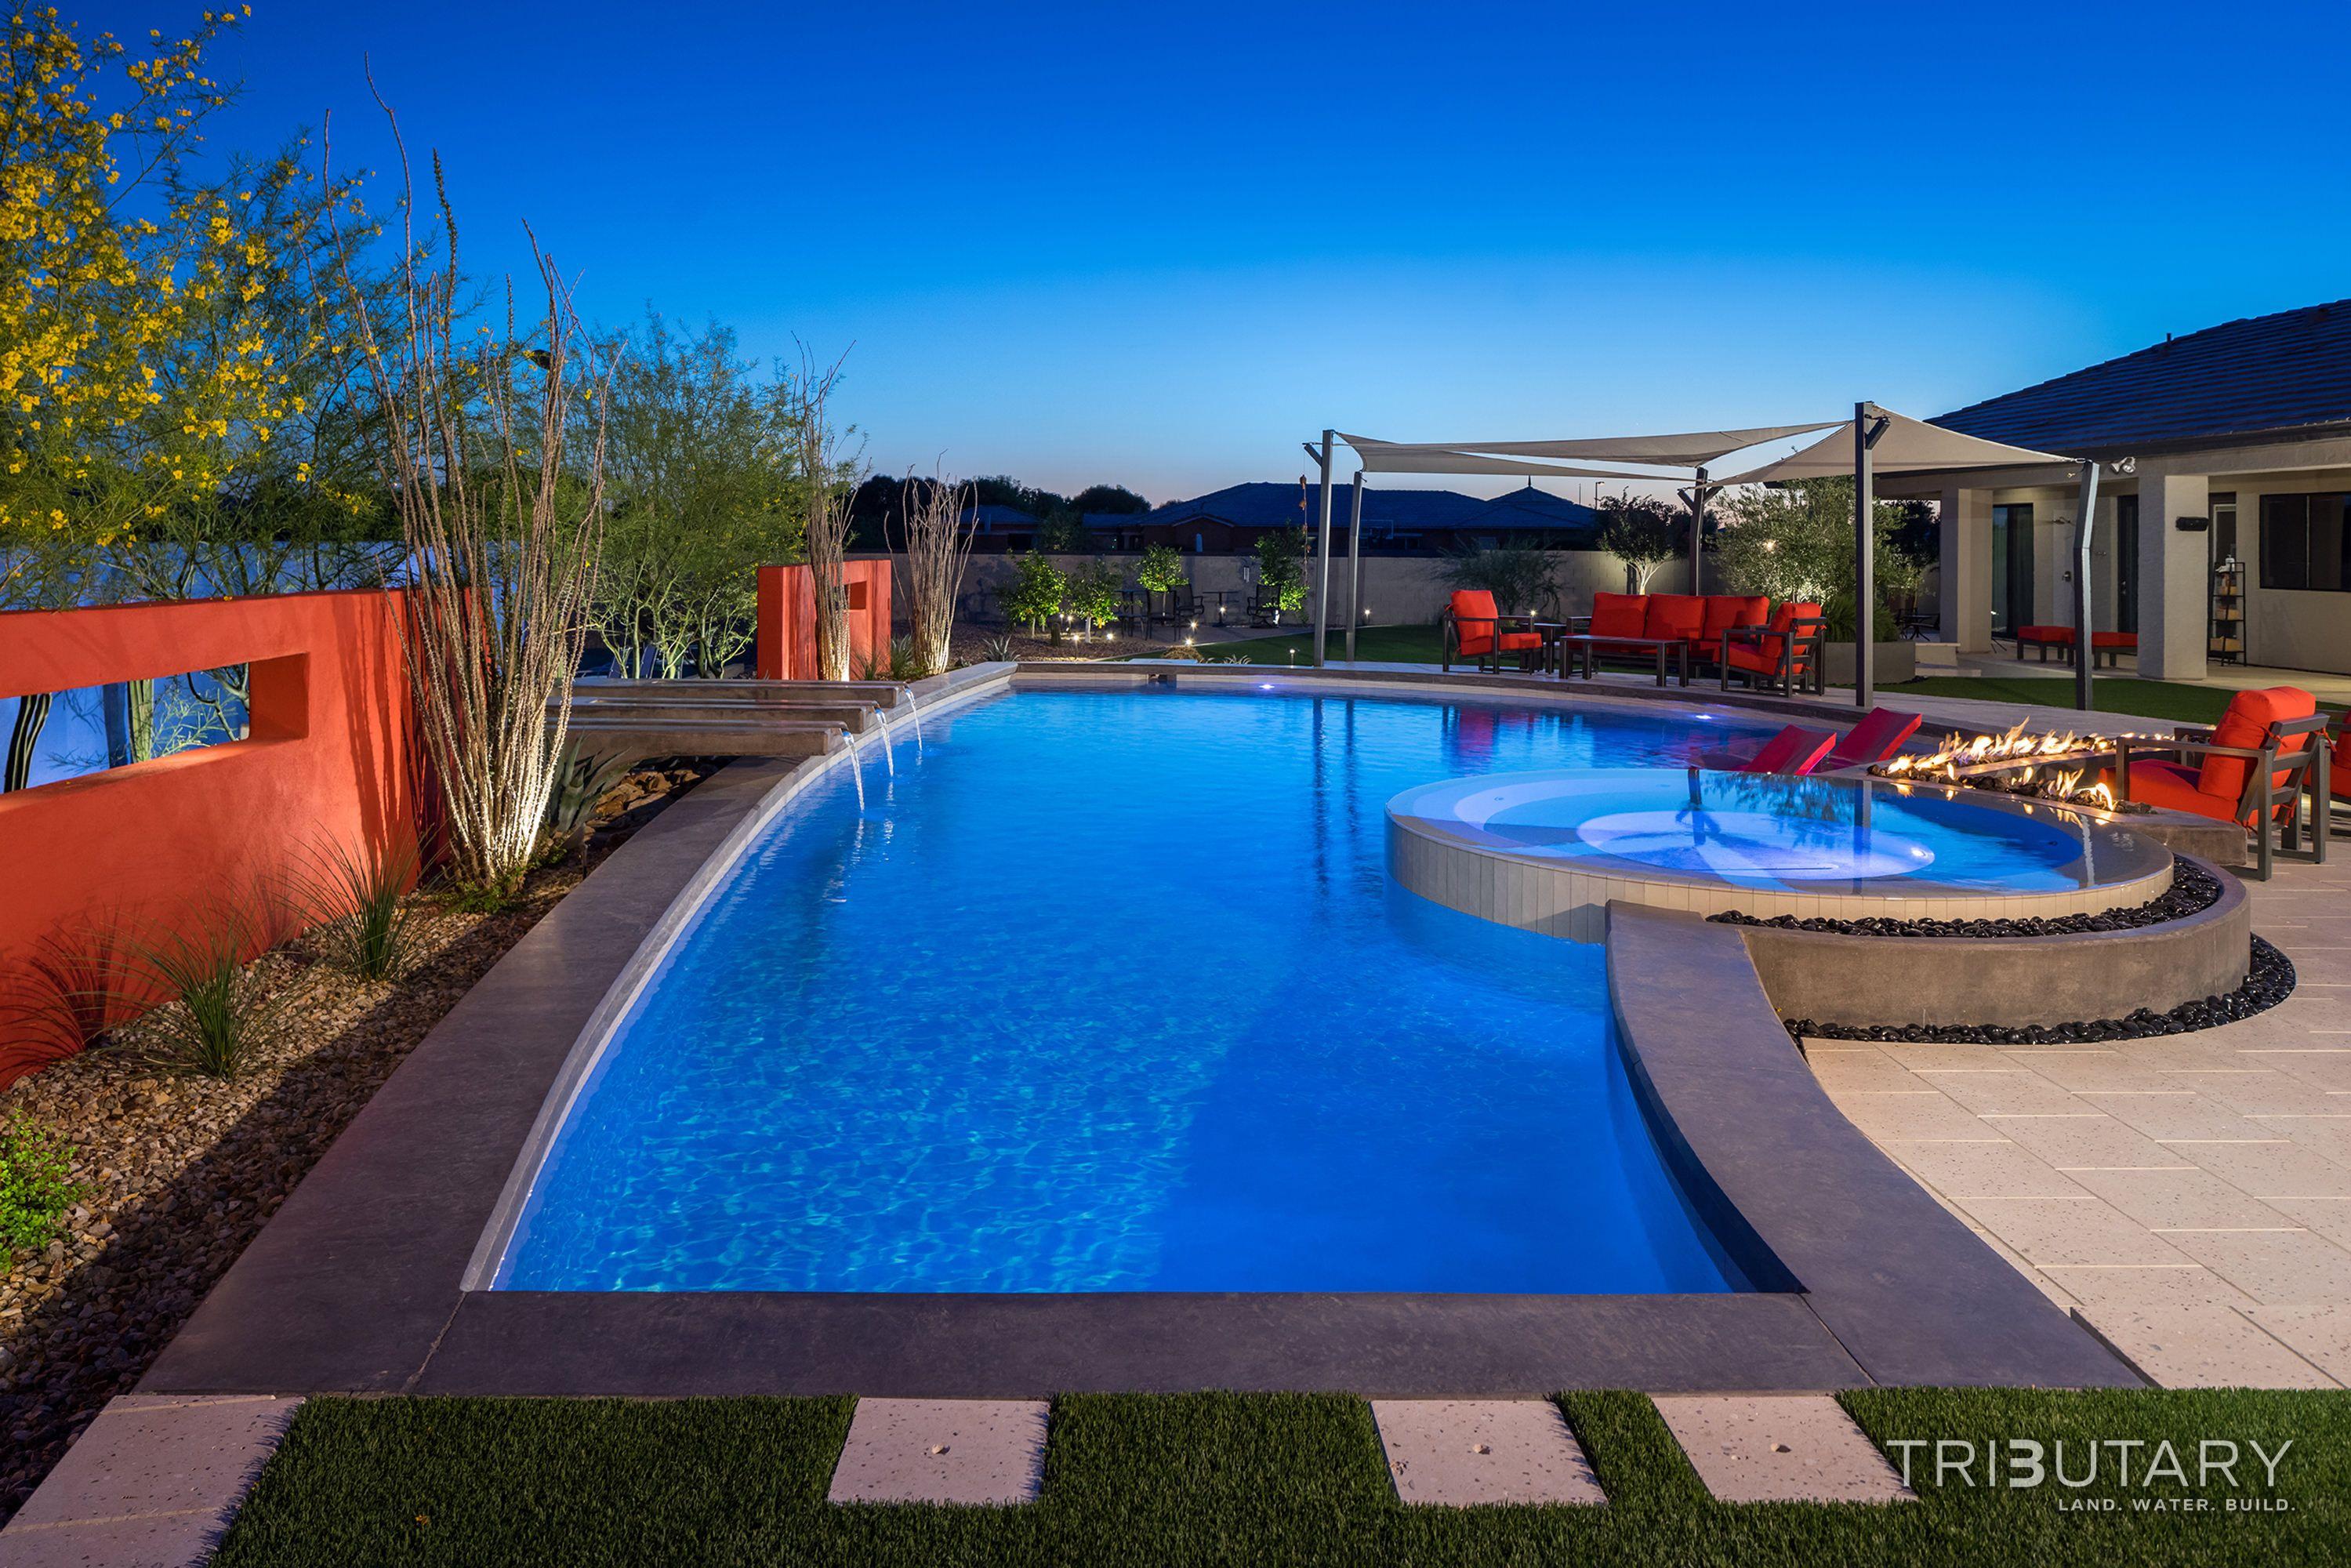 Tributary Pools Custom Pool Sleek Oasis Gilbert Diy Network Pool Kings Gilbert Arizona Paradise Luxury Pool Jeromey Naugle Watersh Custom Pools Pool Kings Pool